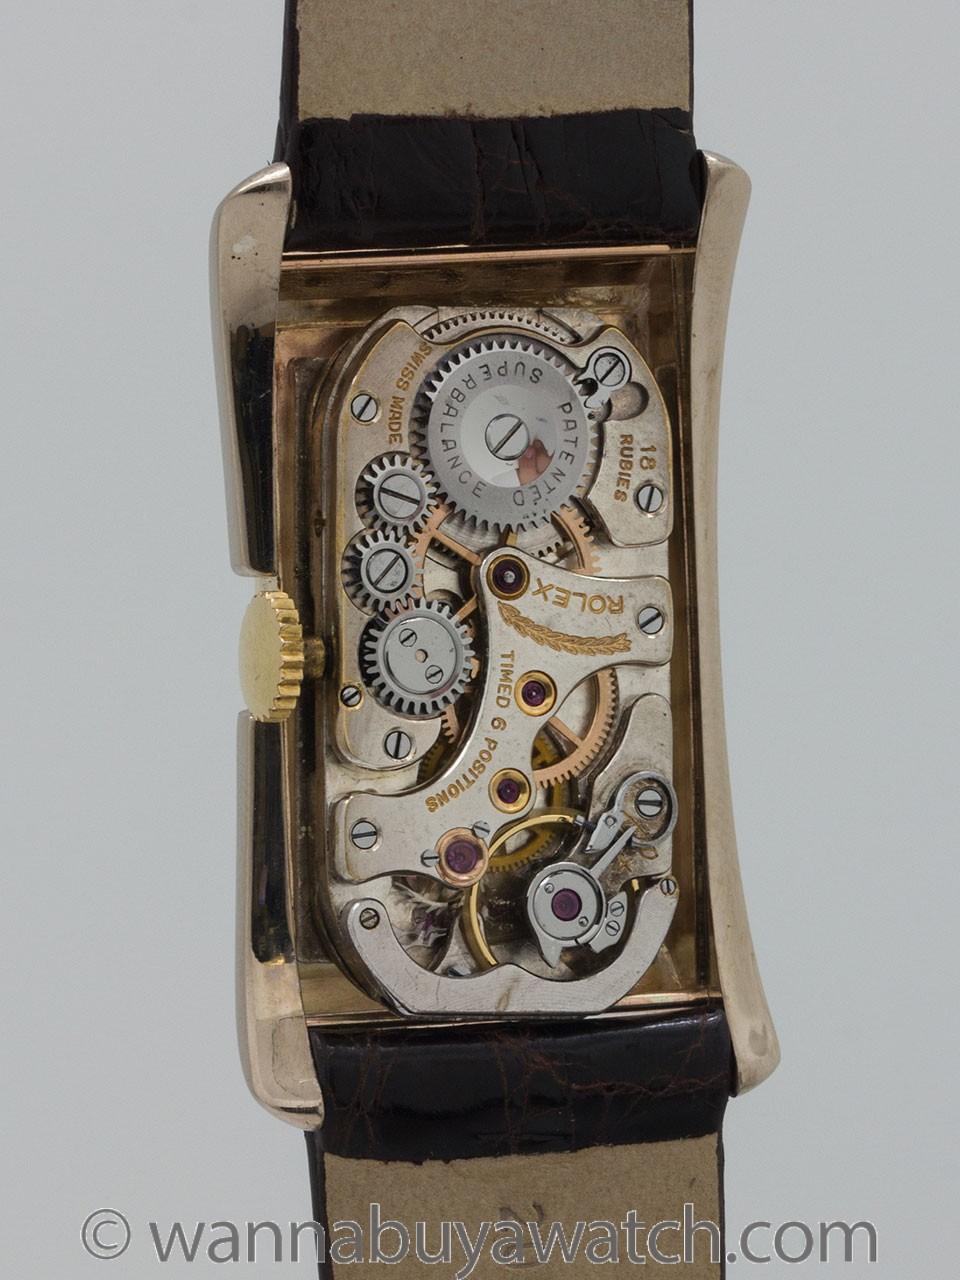 Rolex Prince Doctor's ref 1490 Striped Banchard circa 1930's